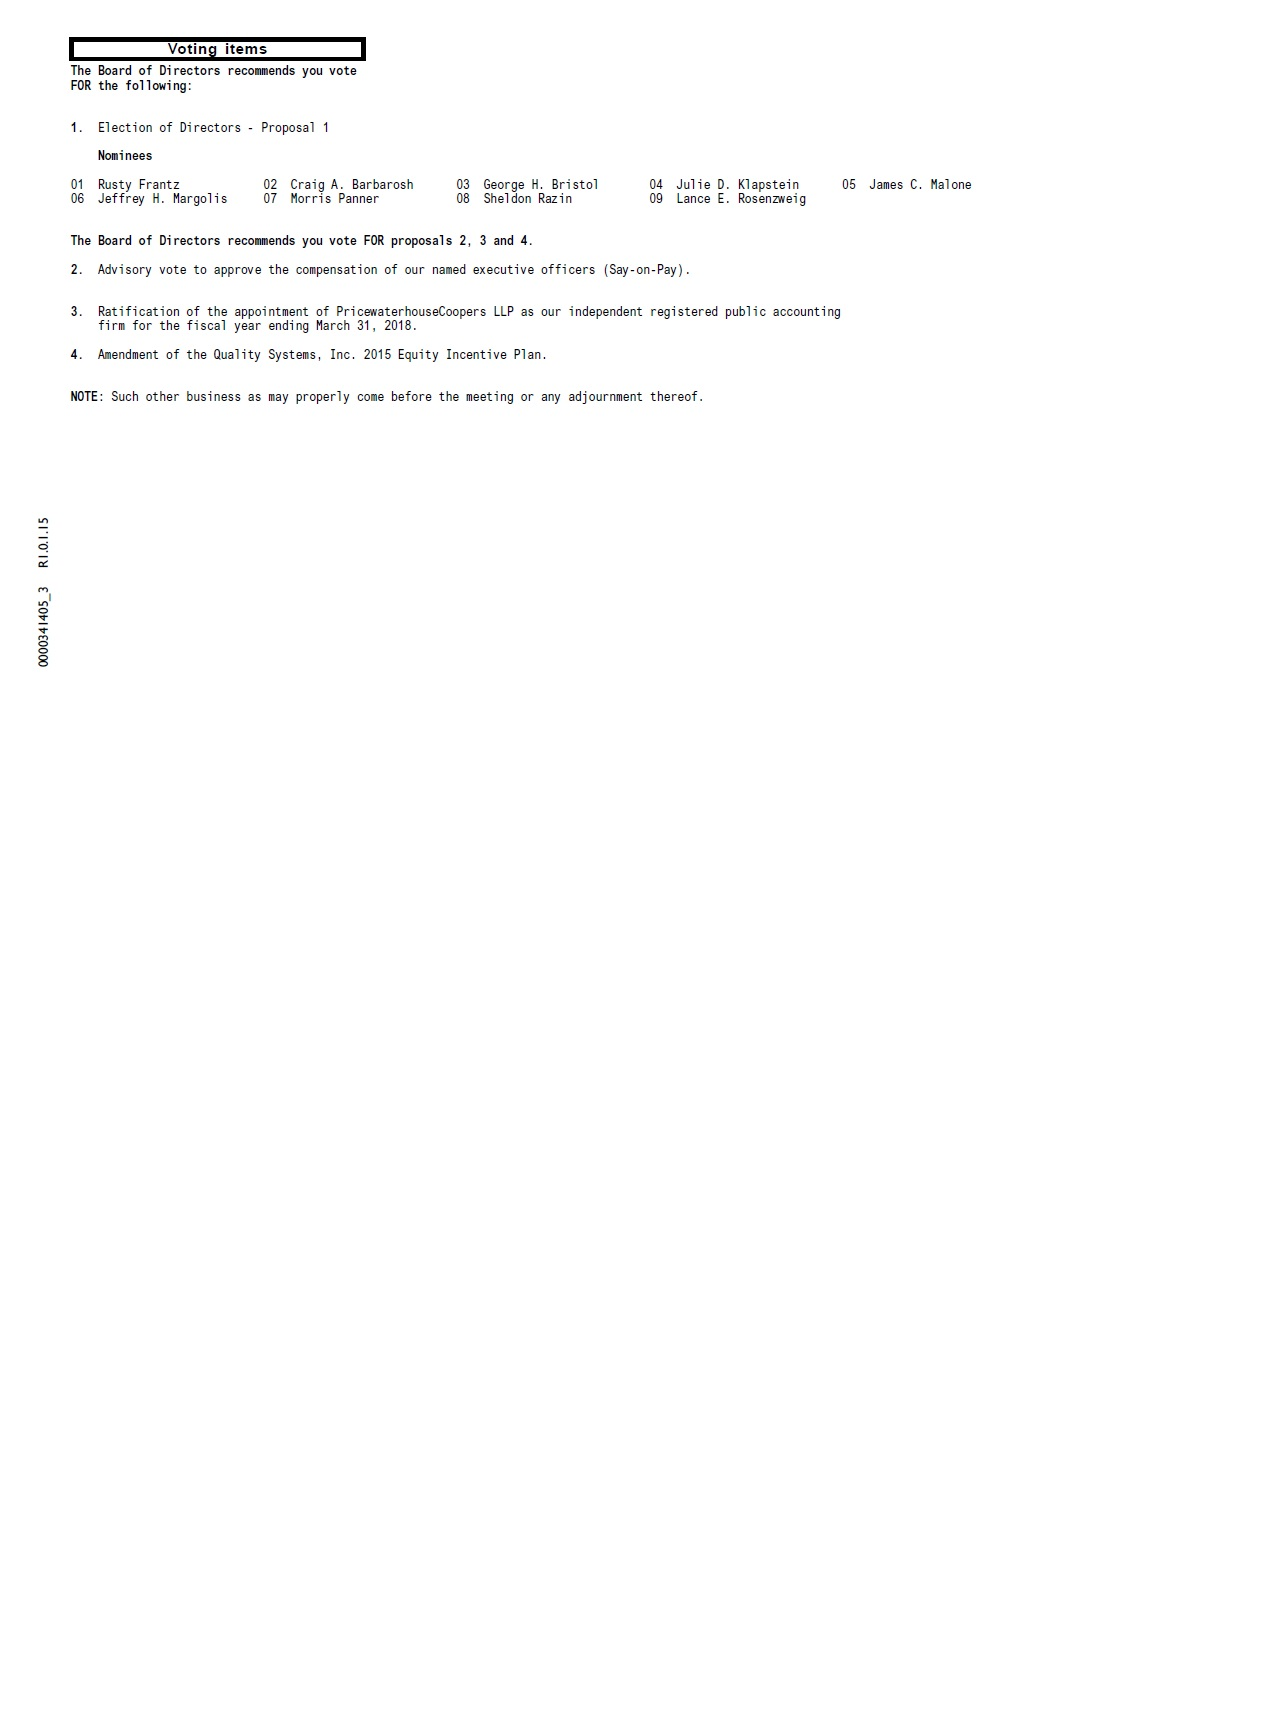 https://cdn.kscope.io/9e29322d5621c875eb3dd6ee69b285e8-proxycard3a03.jpg